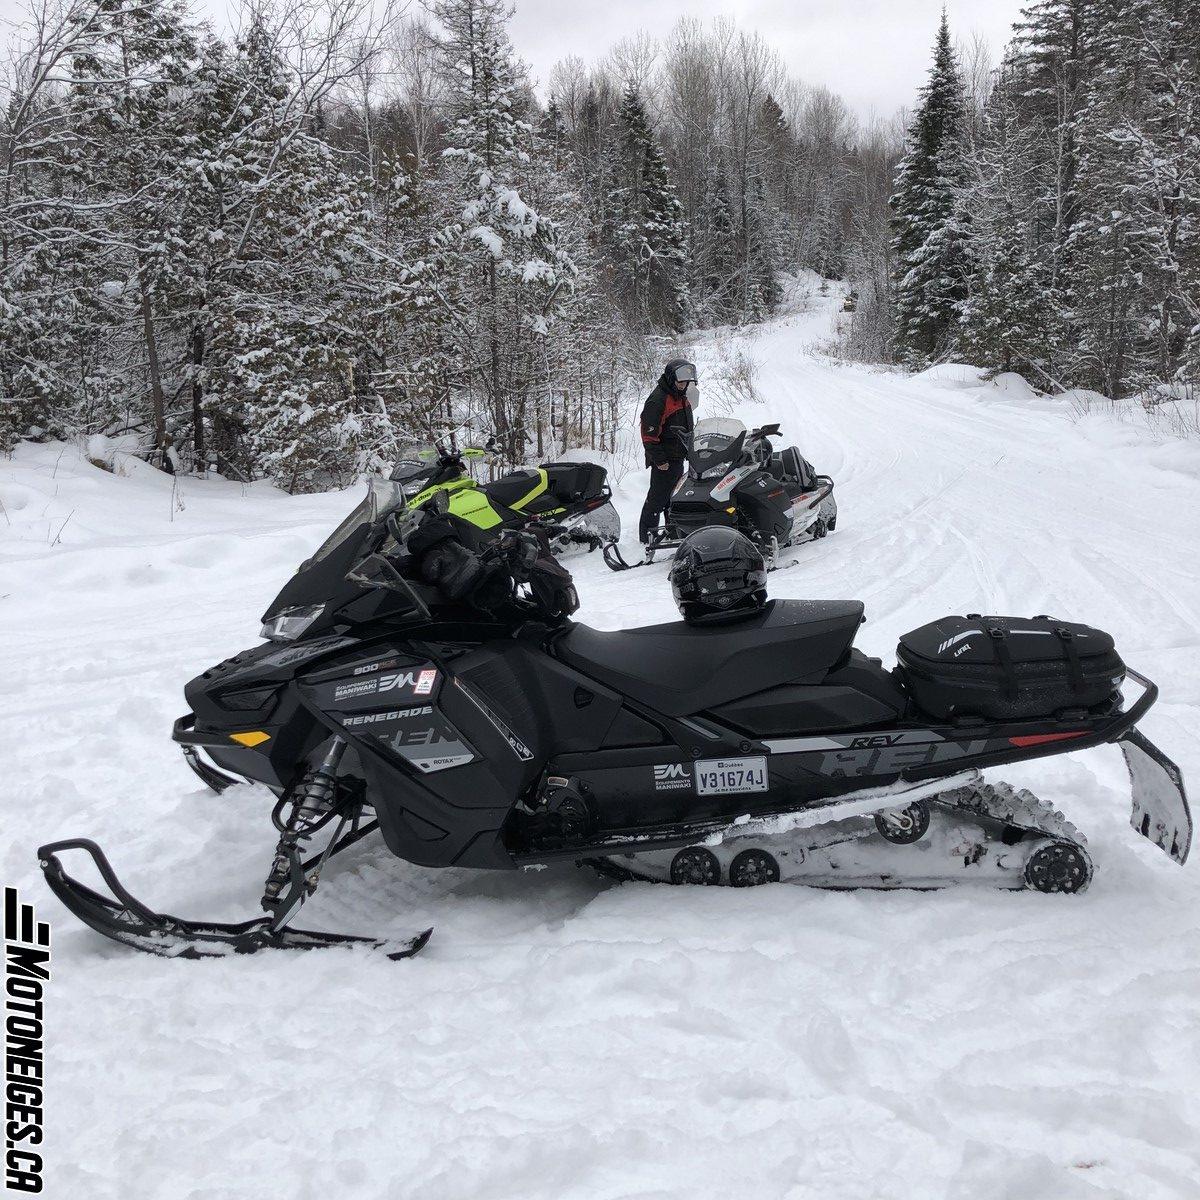 Ski-Doo Renegade Adrenaline 900 ACE Turbo 2021